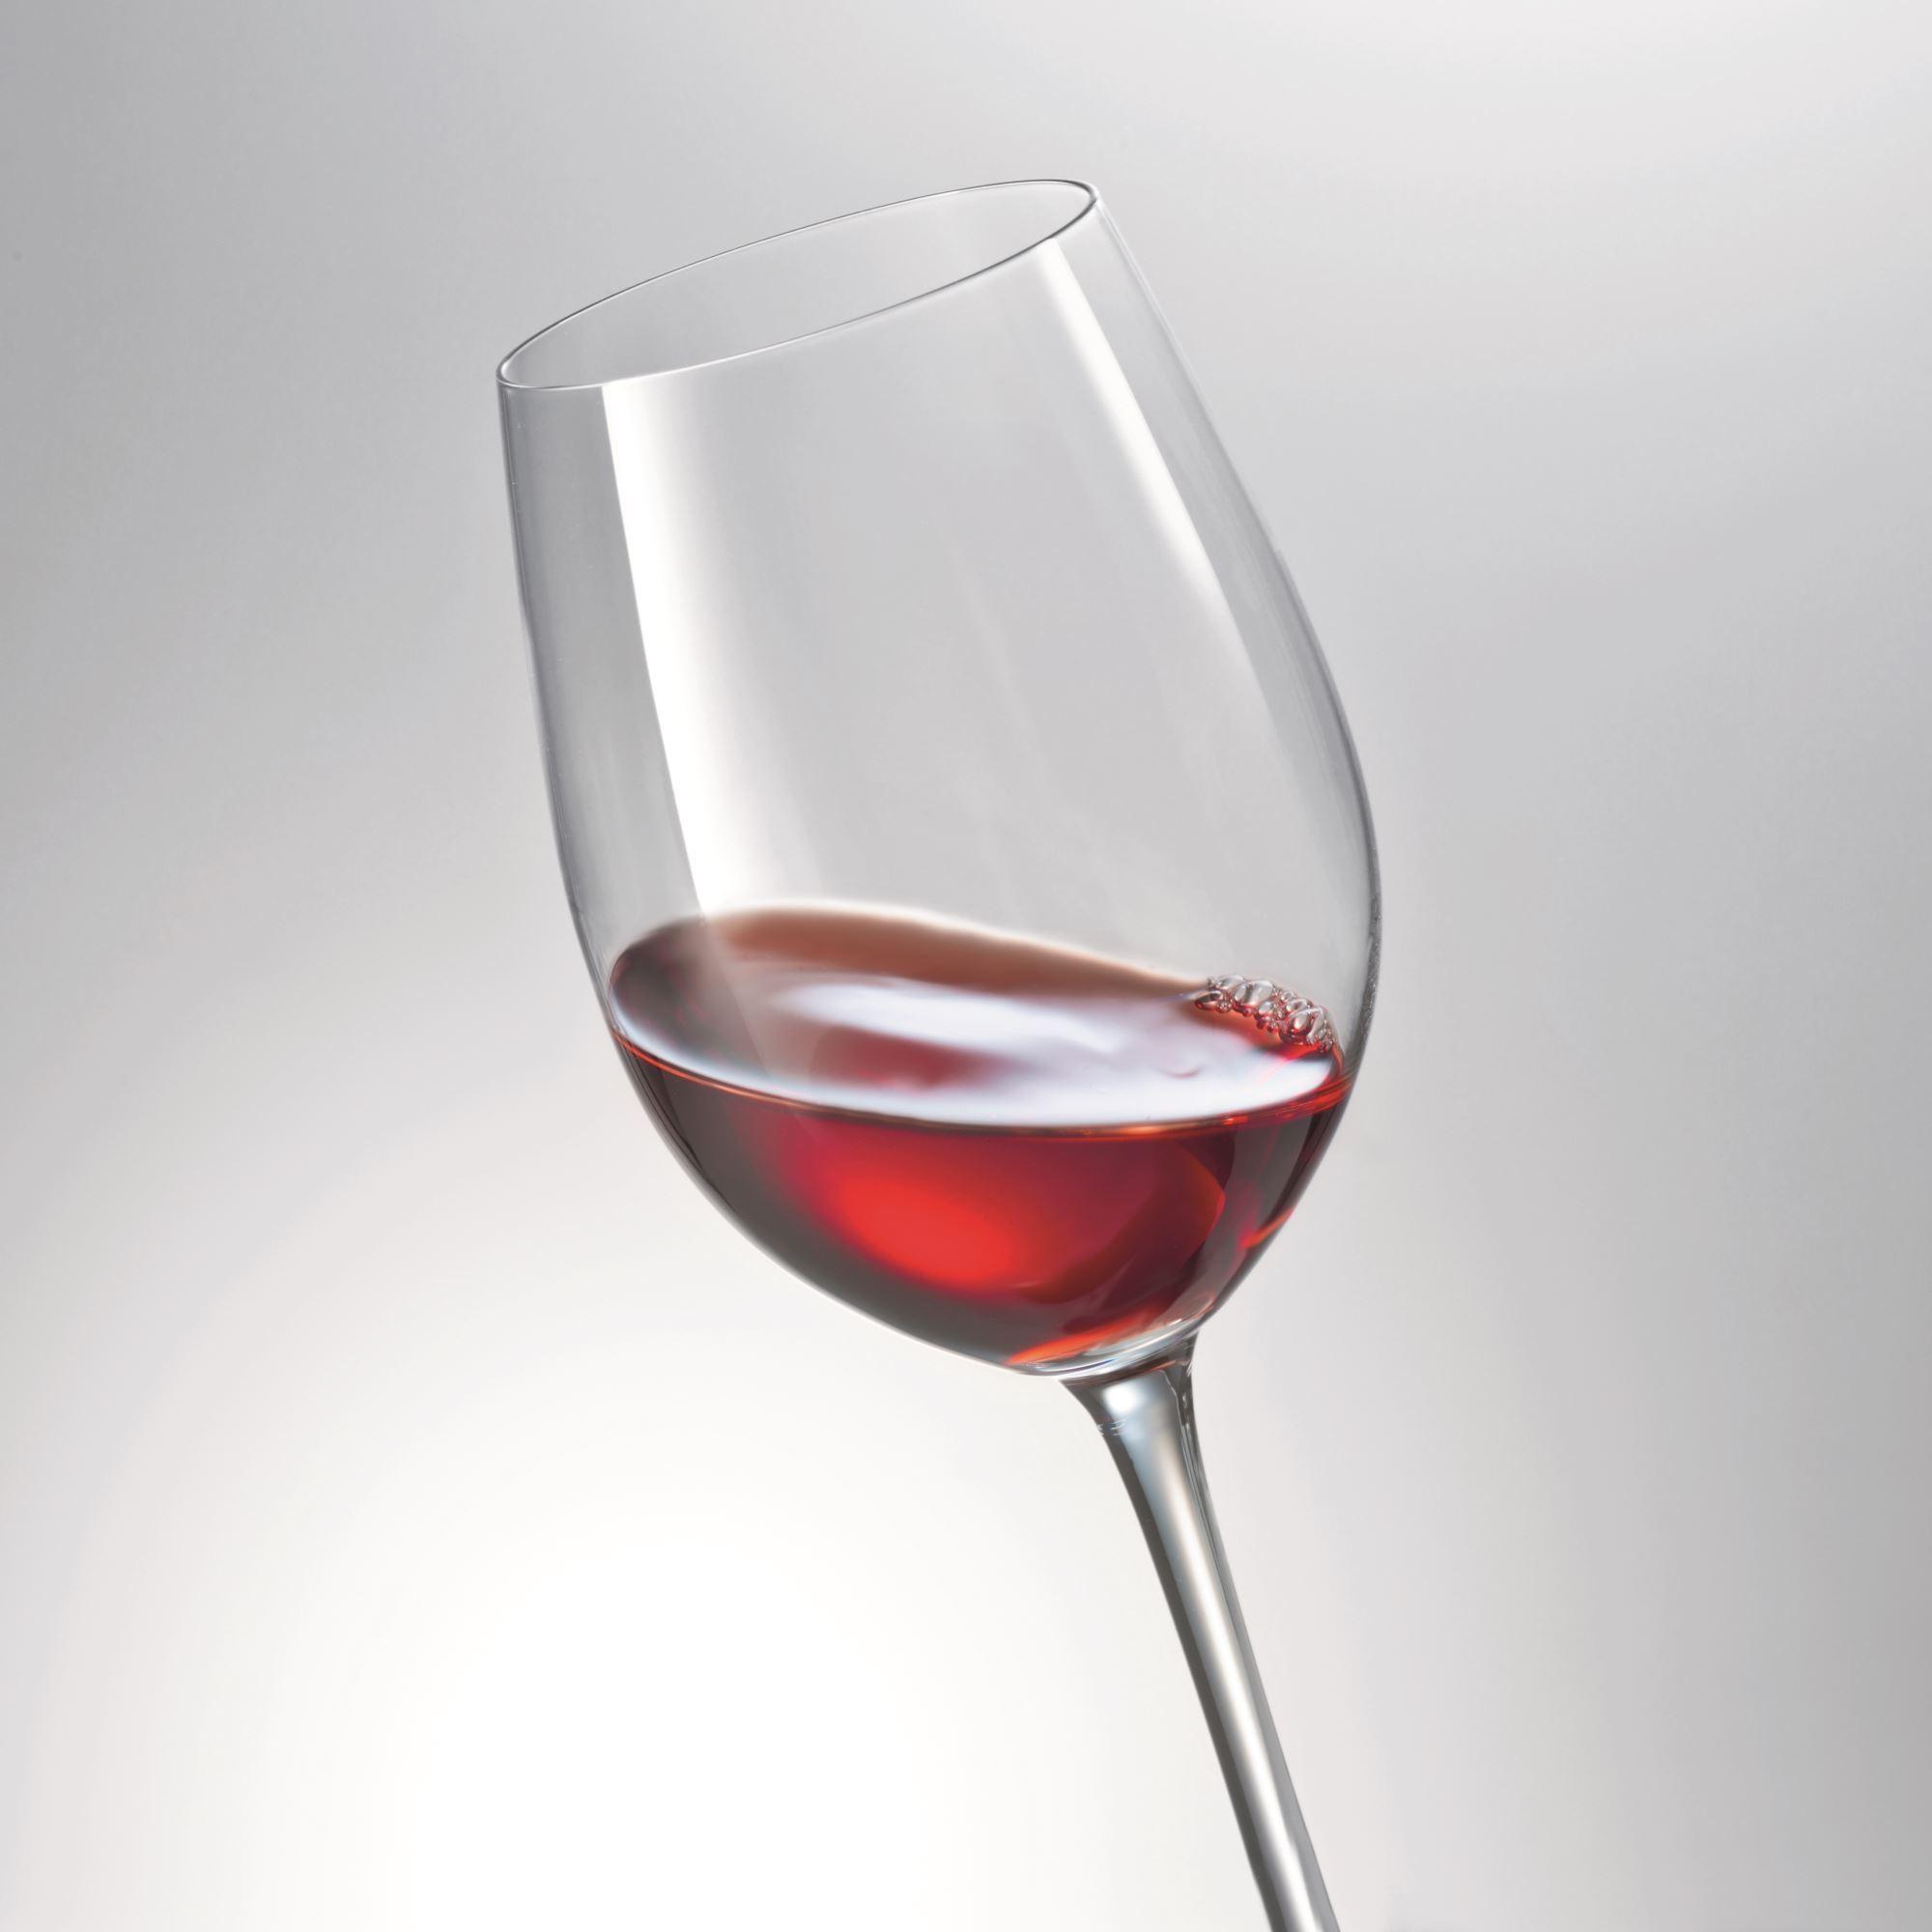 Schott zwiesel serie classico bordeauxglas 6 st ck inhalt for Ebay classico